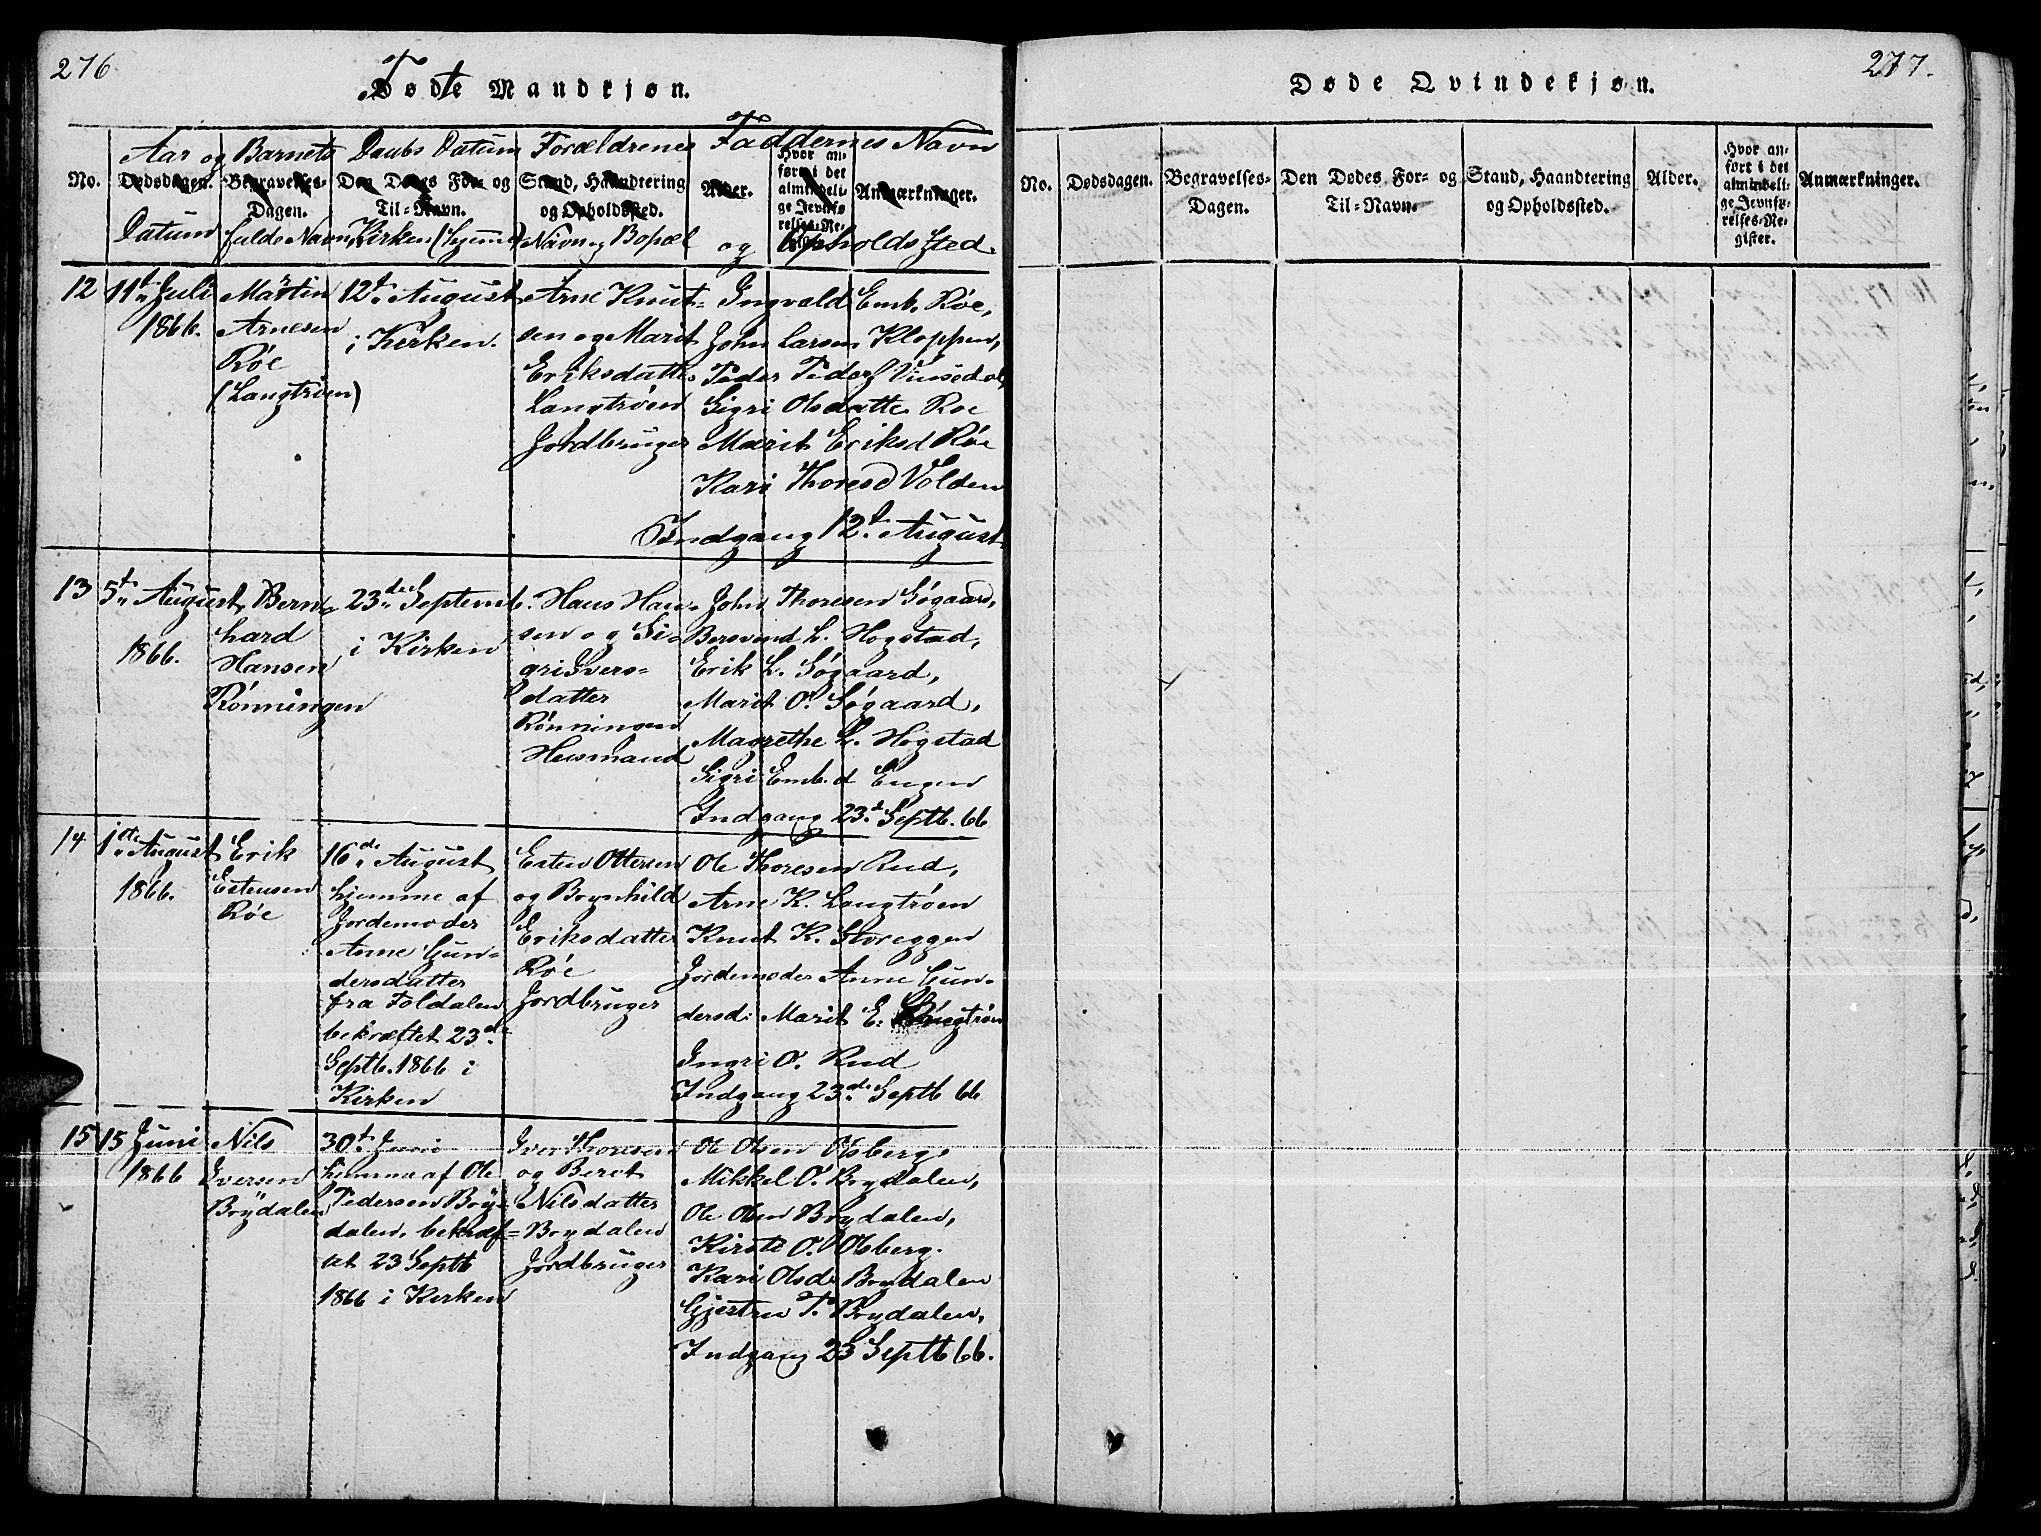 SAH, Tynset prestekontor, Klokkerbok nr. 4, 1814-1879, s. 276-277